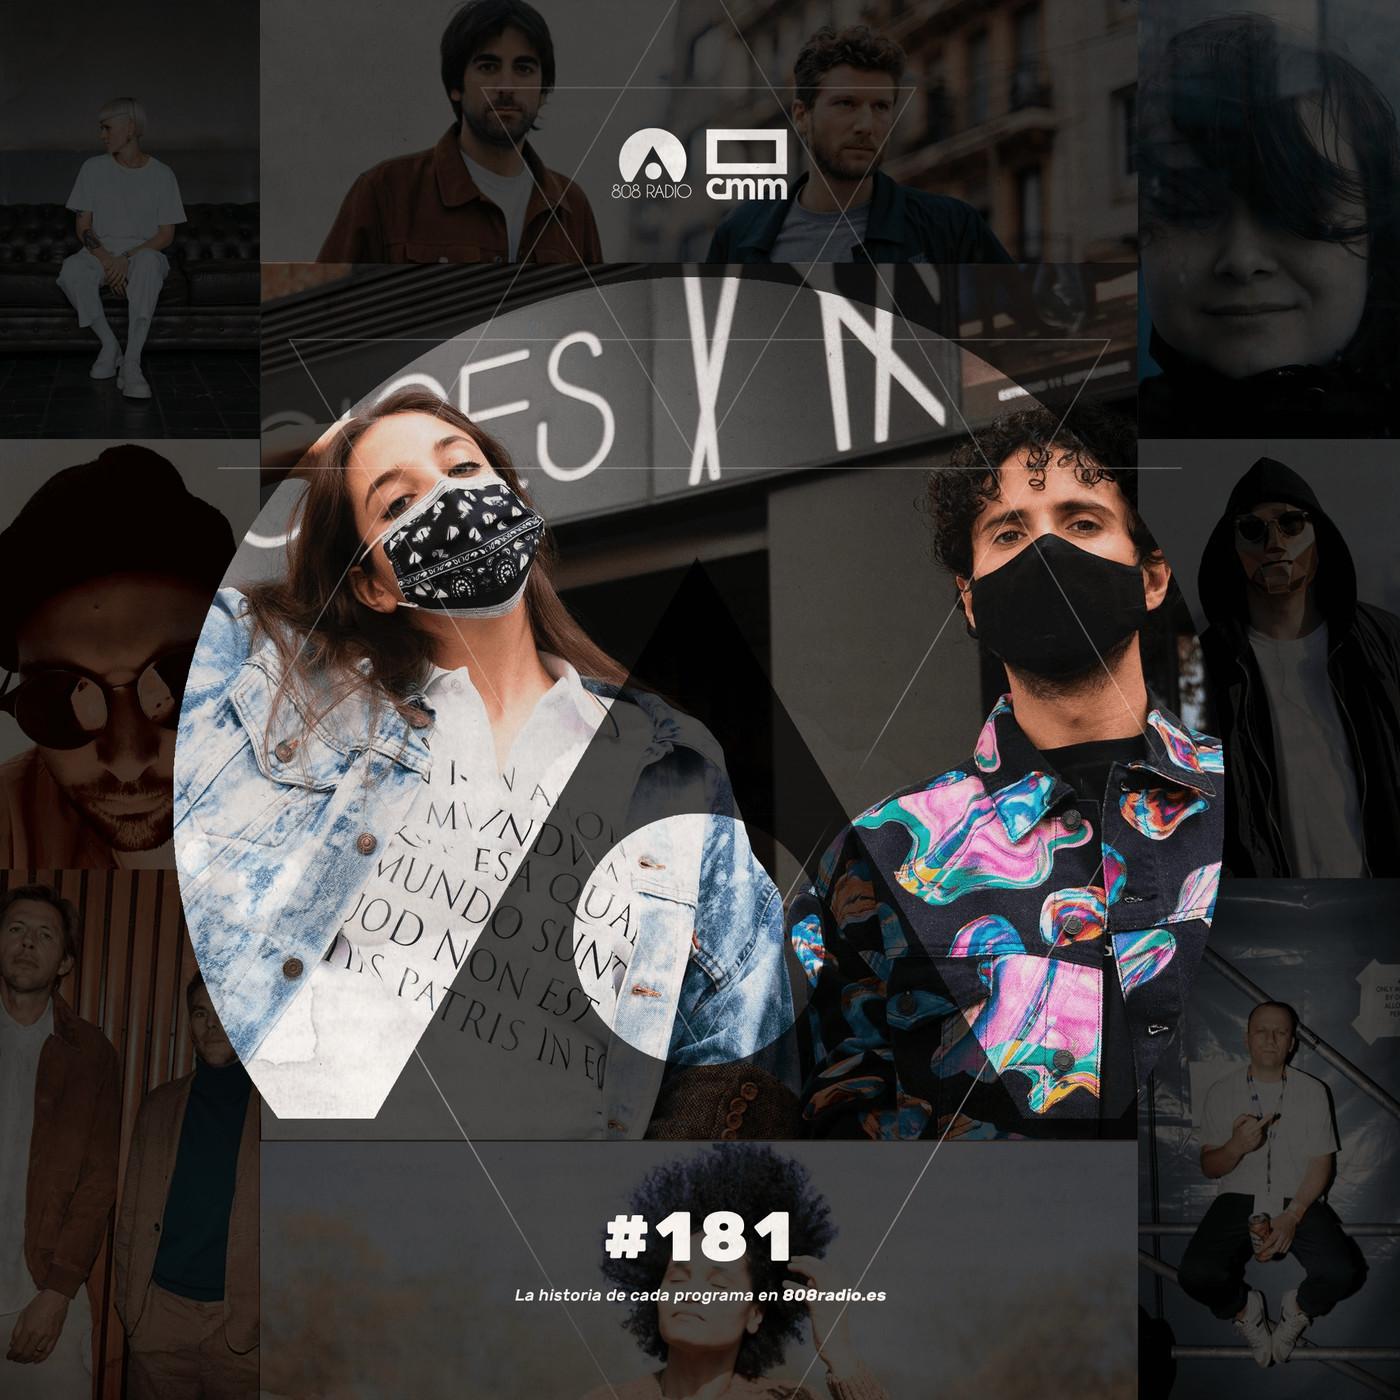 808 Radio #181 / Delaporte / CMM Radio – 26/9/2020